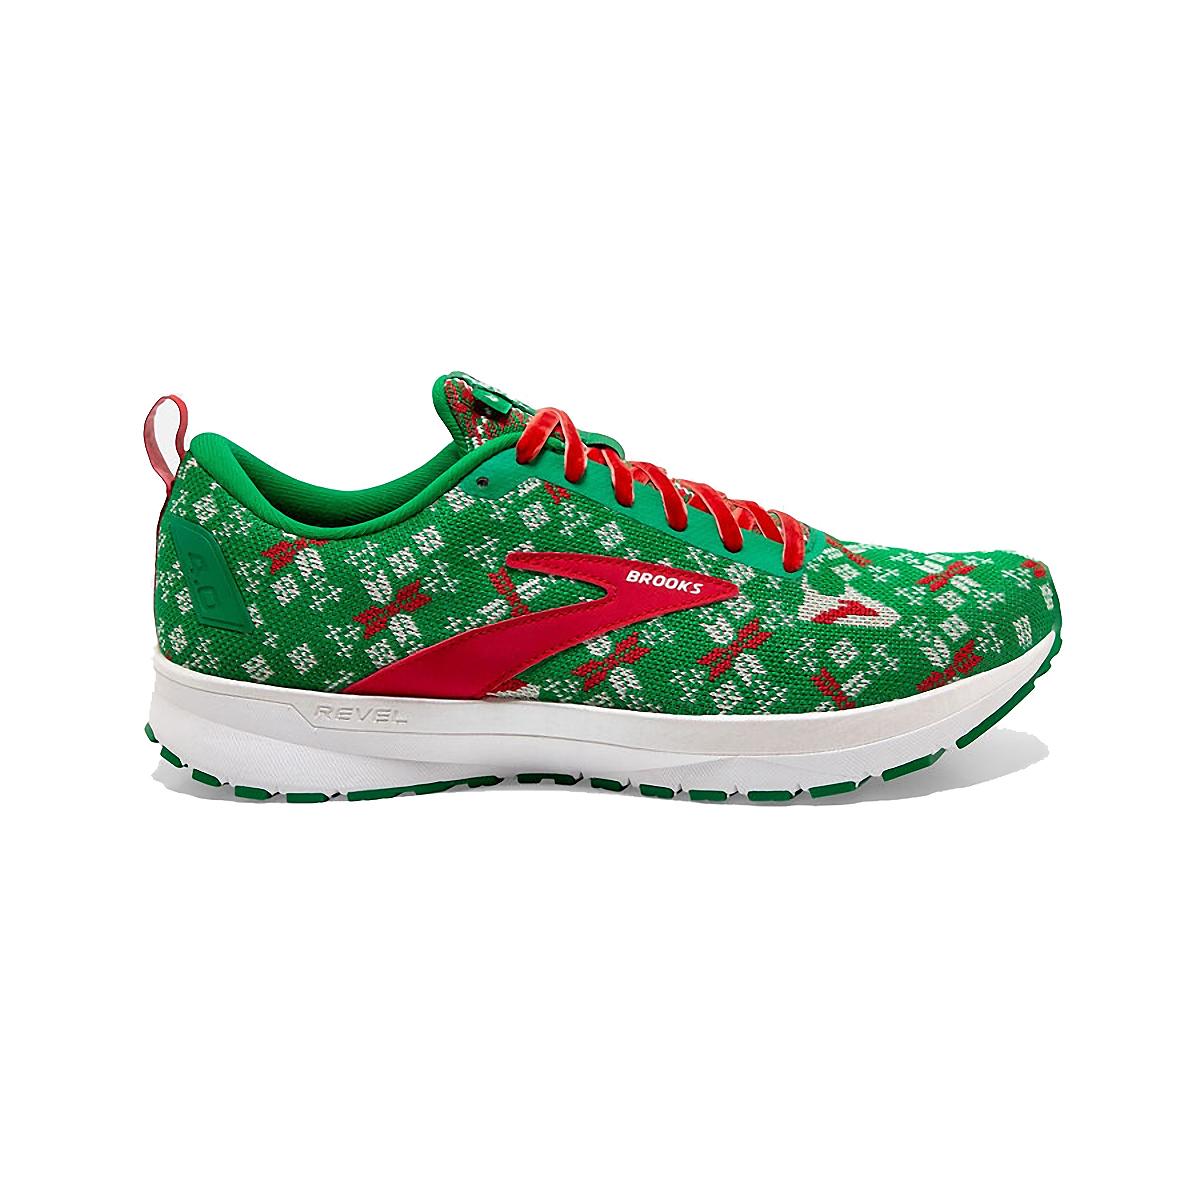 Men's Brooks Run Merry Revel 4 Running Shoe - Color: Jolly Green/Red/White - Size: 7 - Width: Regular, Jolly Green/Red/White, large, image 1